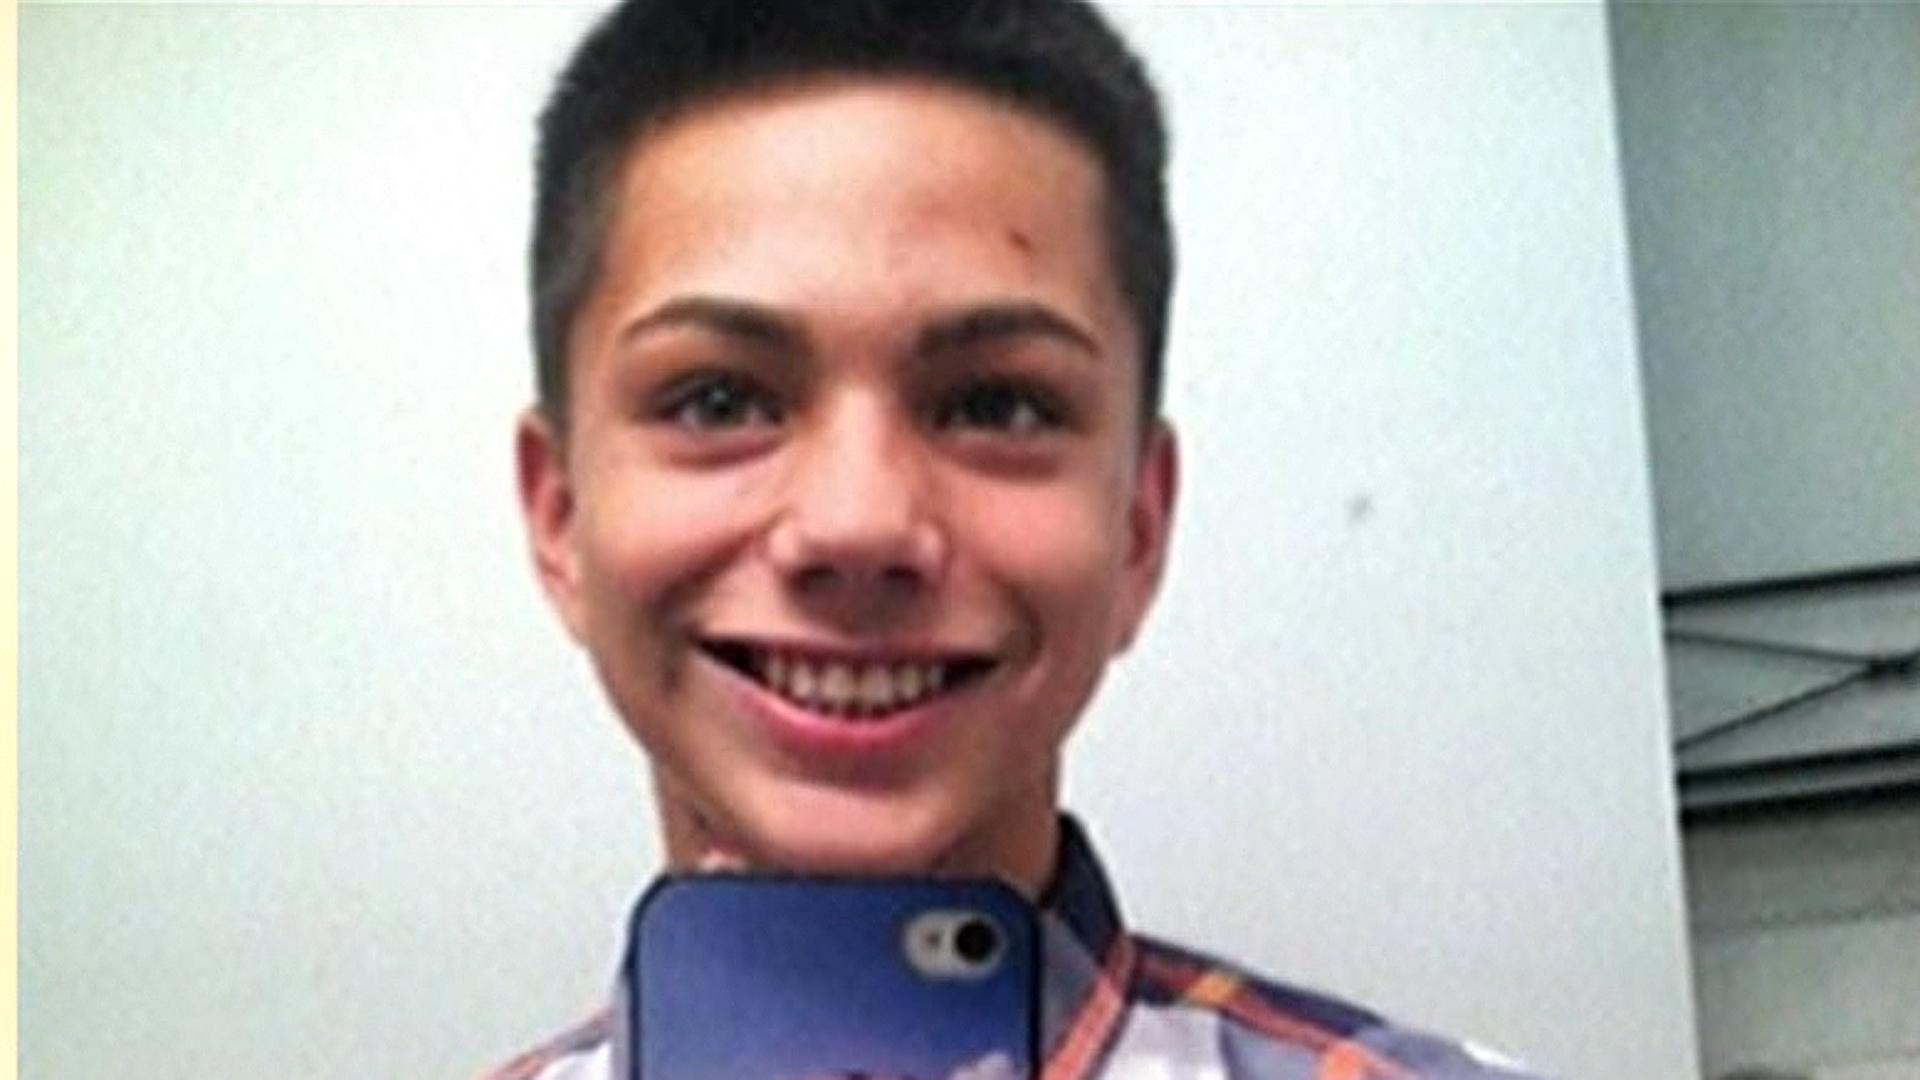 Marysville High School Victim Andrew Fryberg Dies After Shooting